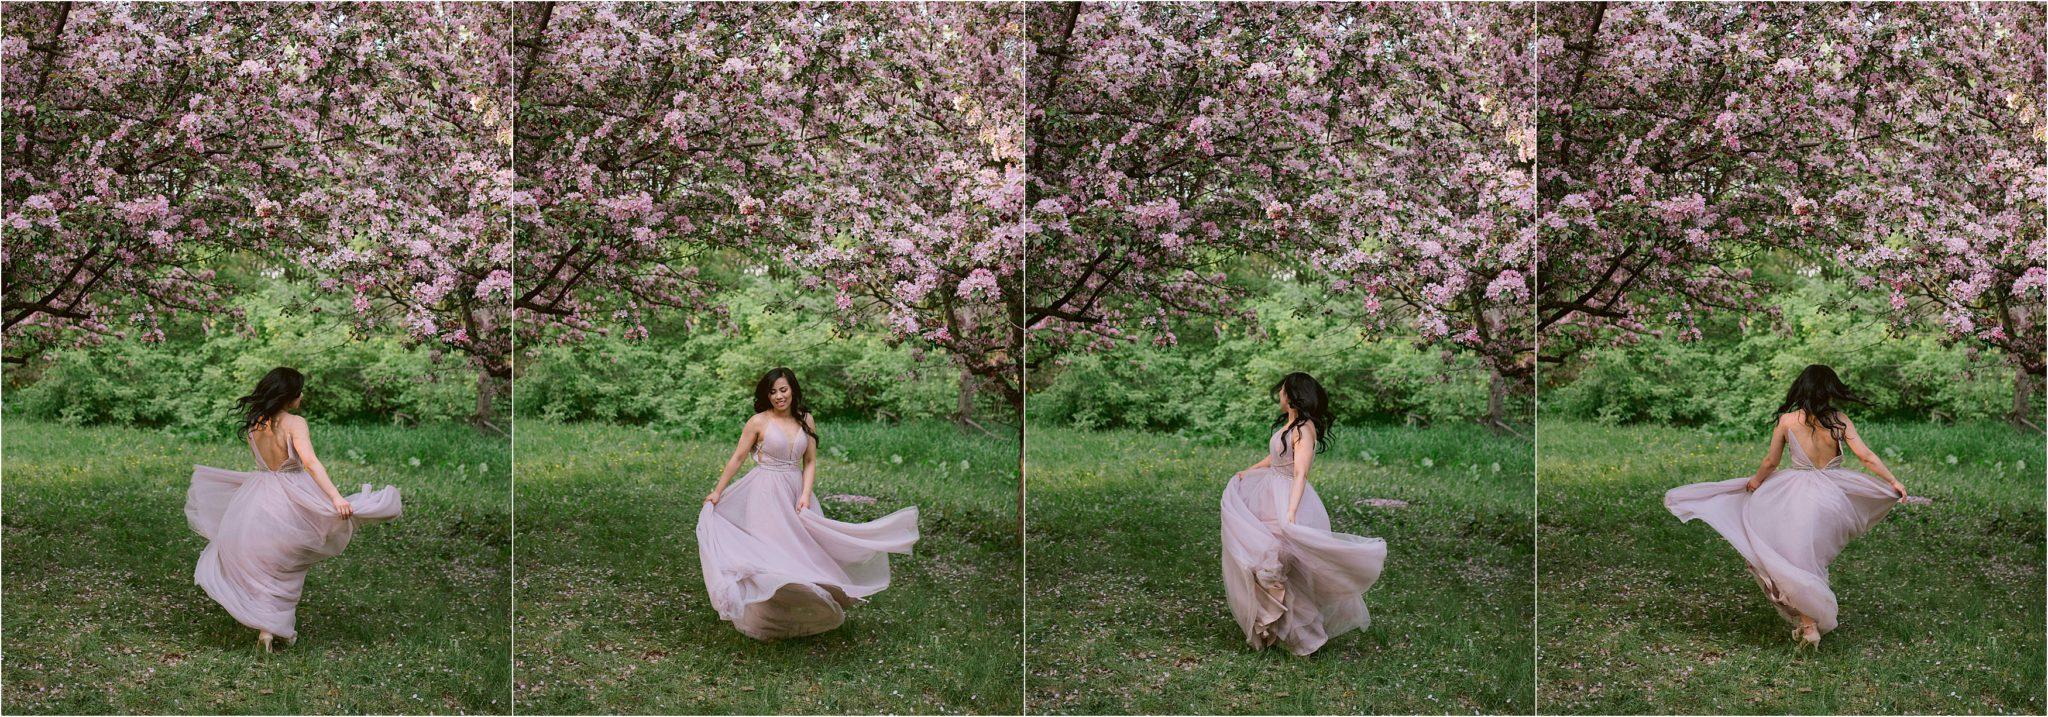 cherry-blossoms-engagement-photos